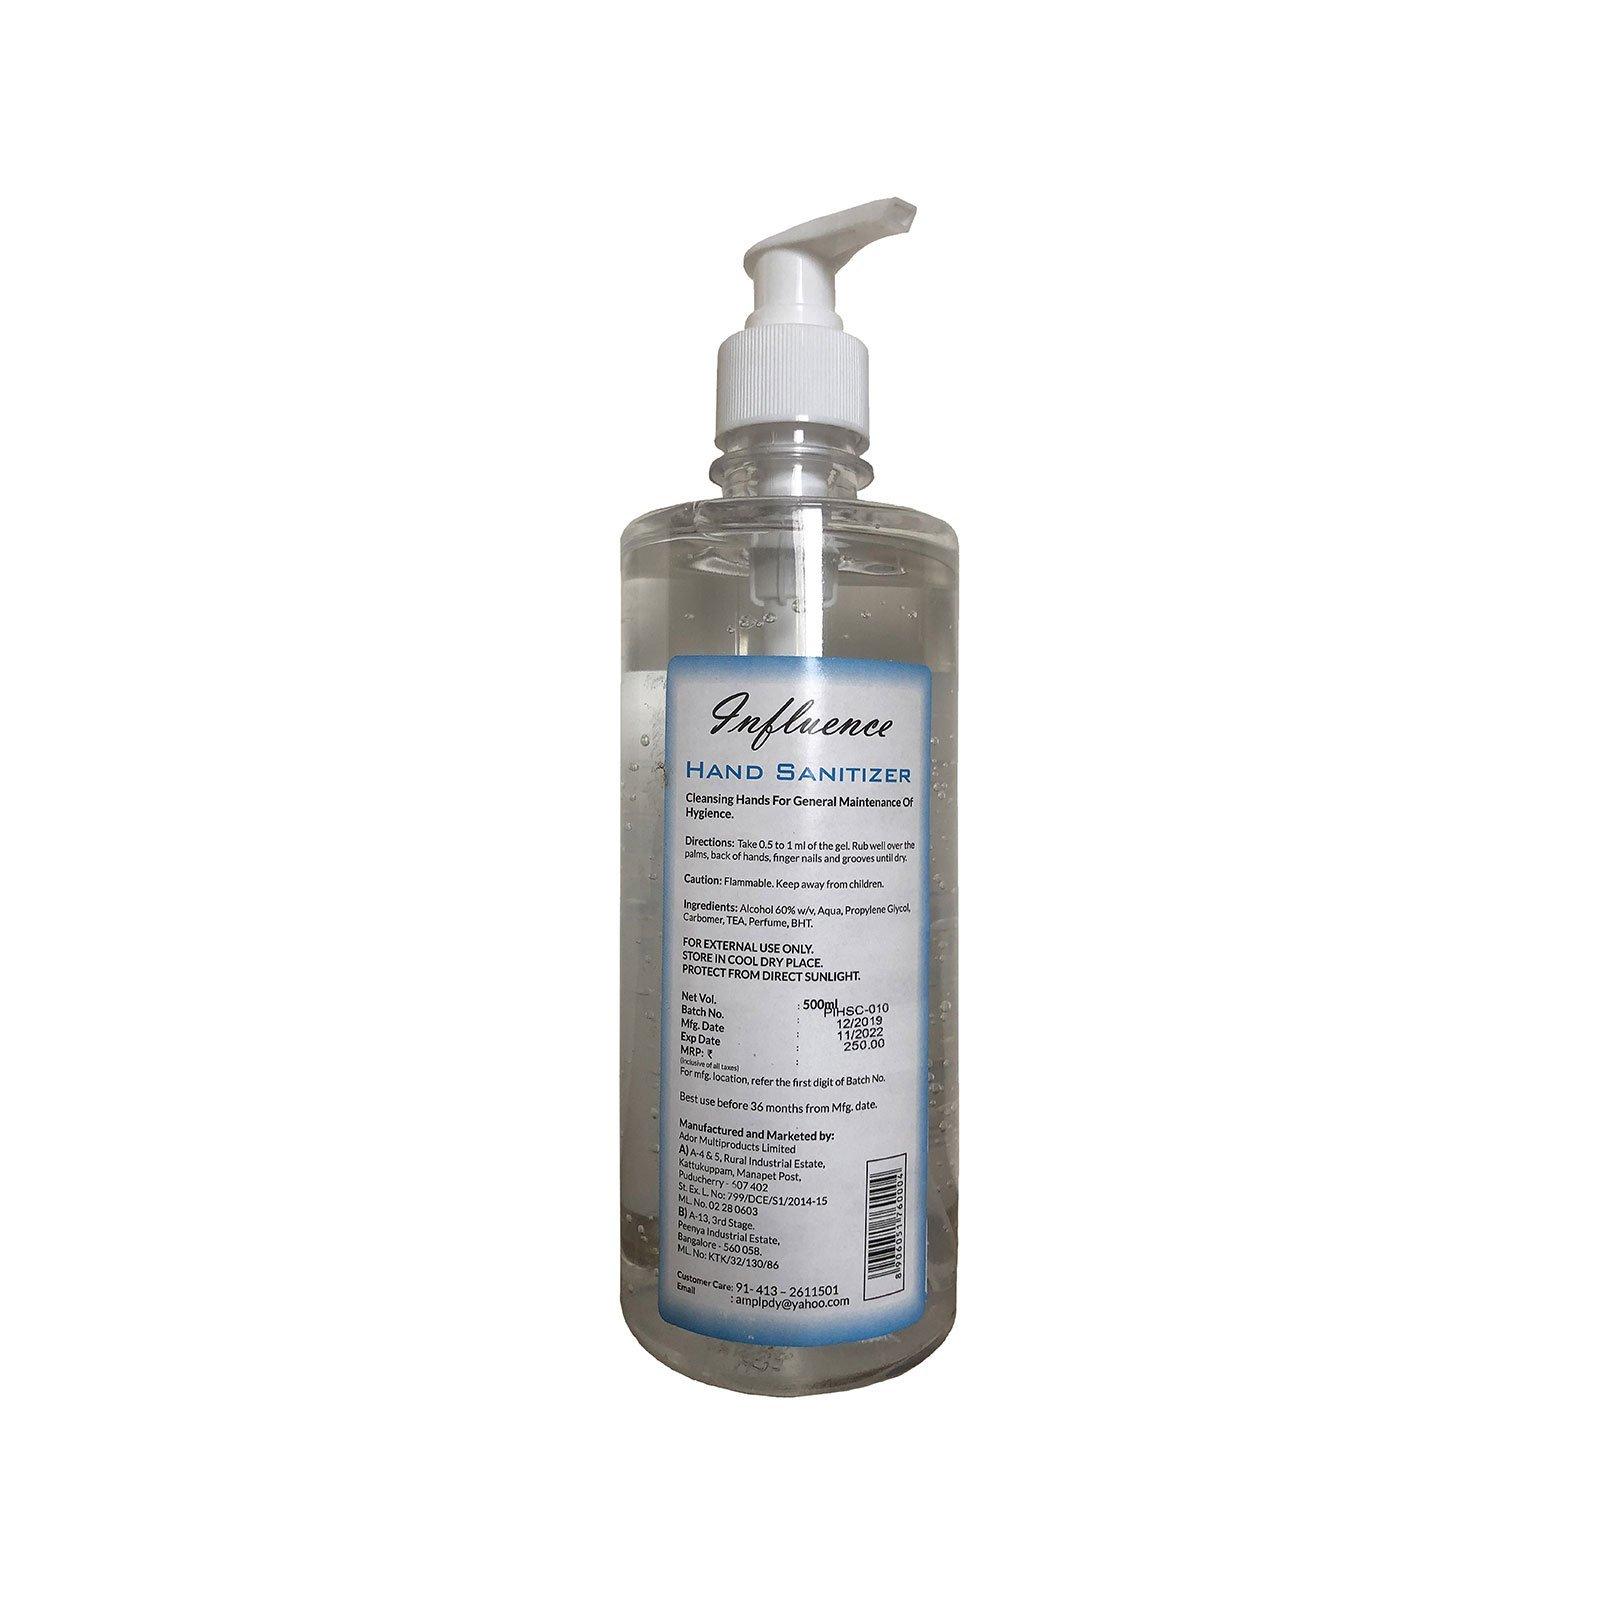 Influence Hand Sanitizer   500 ml